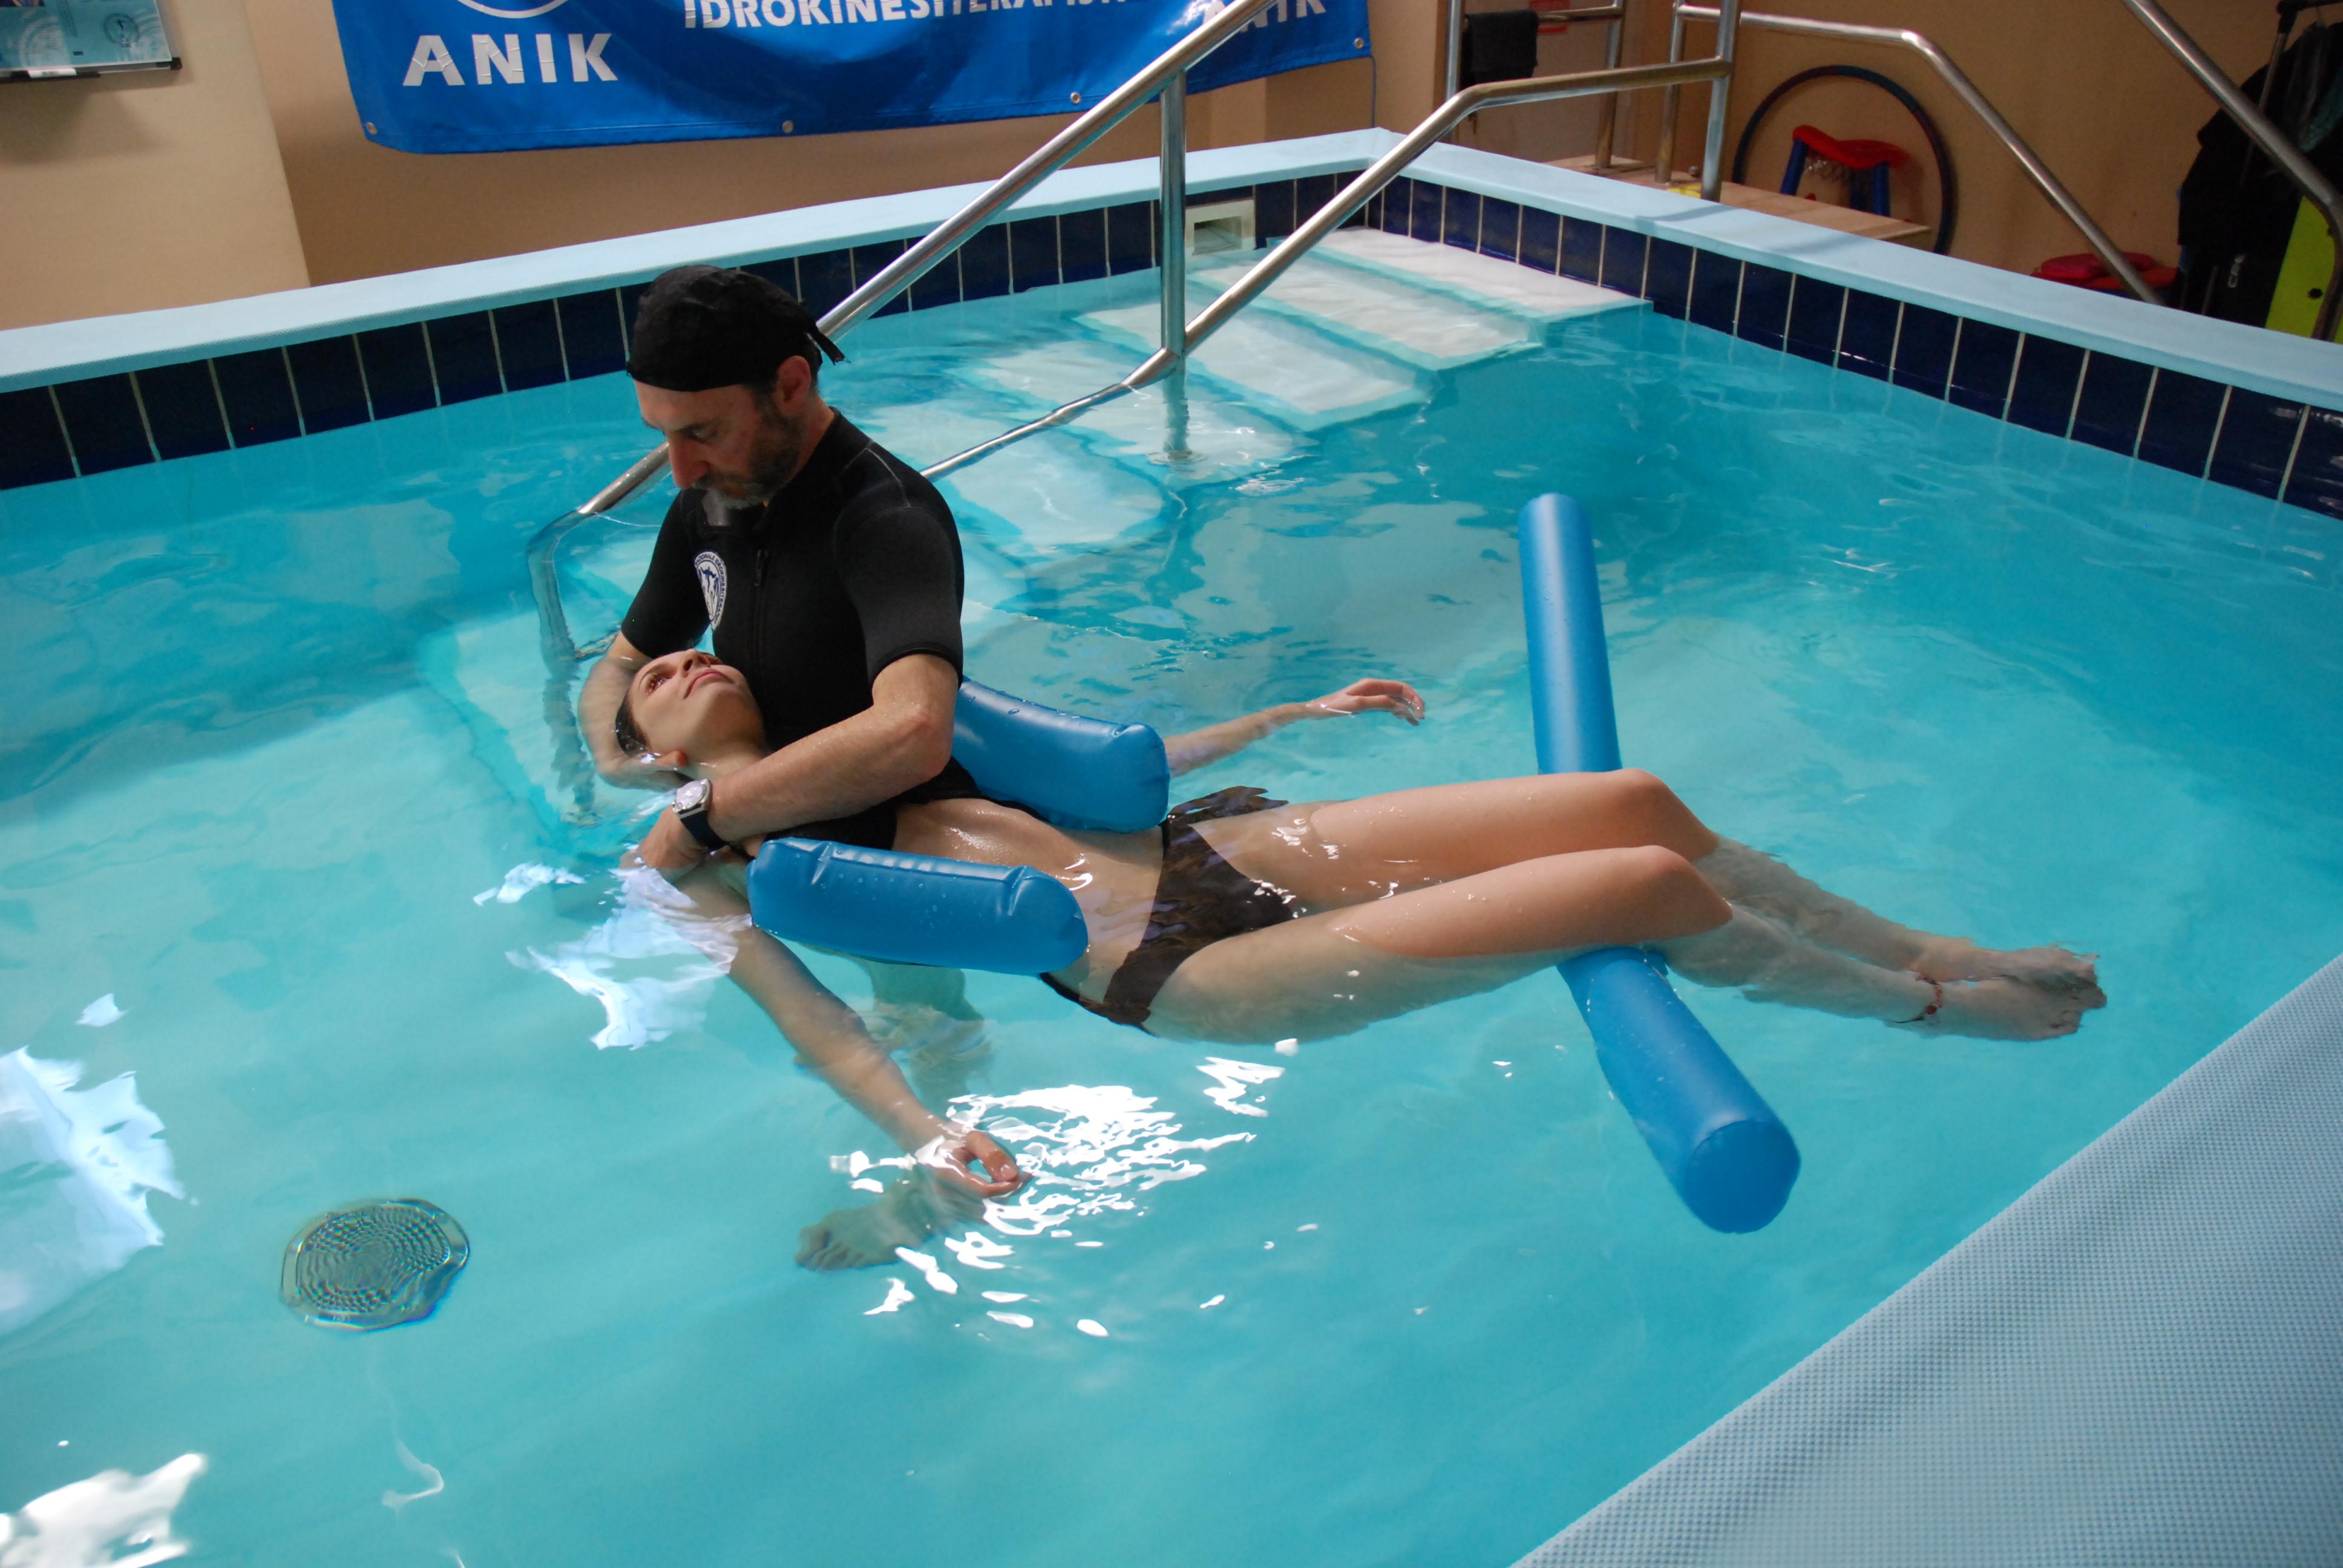 idrokinesiterapia schemi cognitivi fisici in acqua